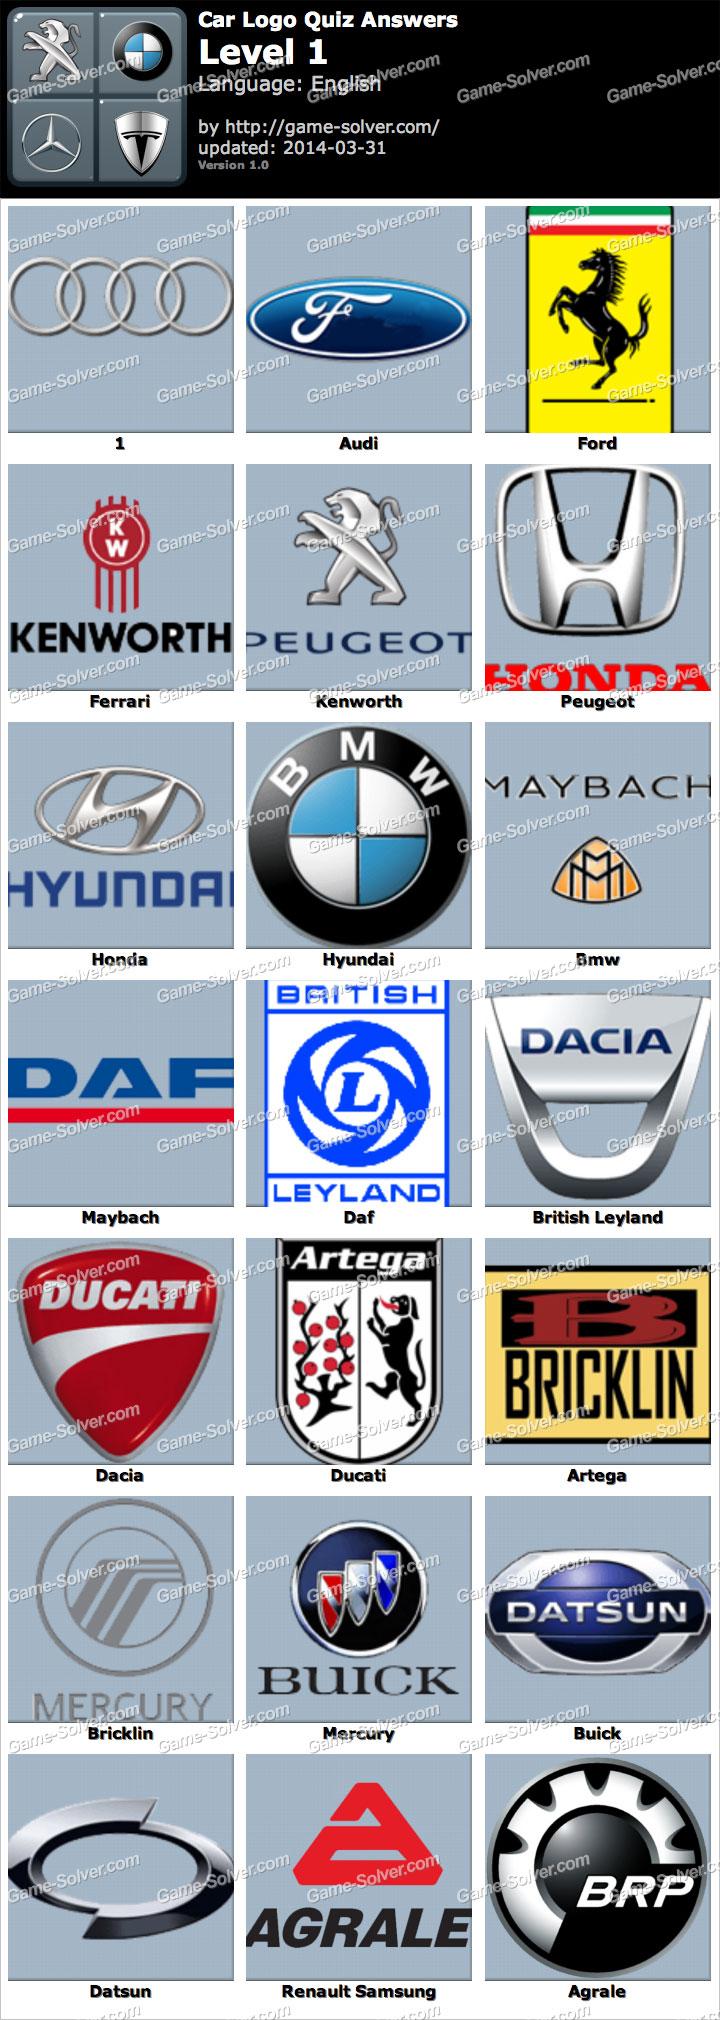 Car Logo Quiz Answers - Game Solver